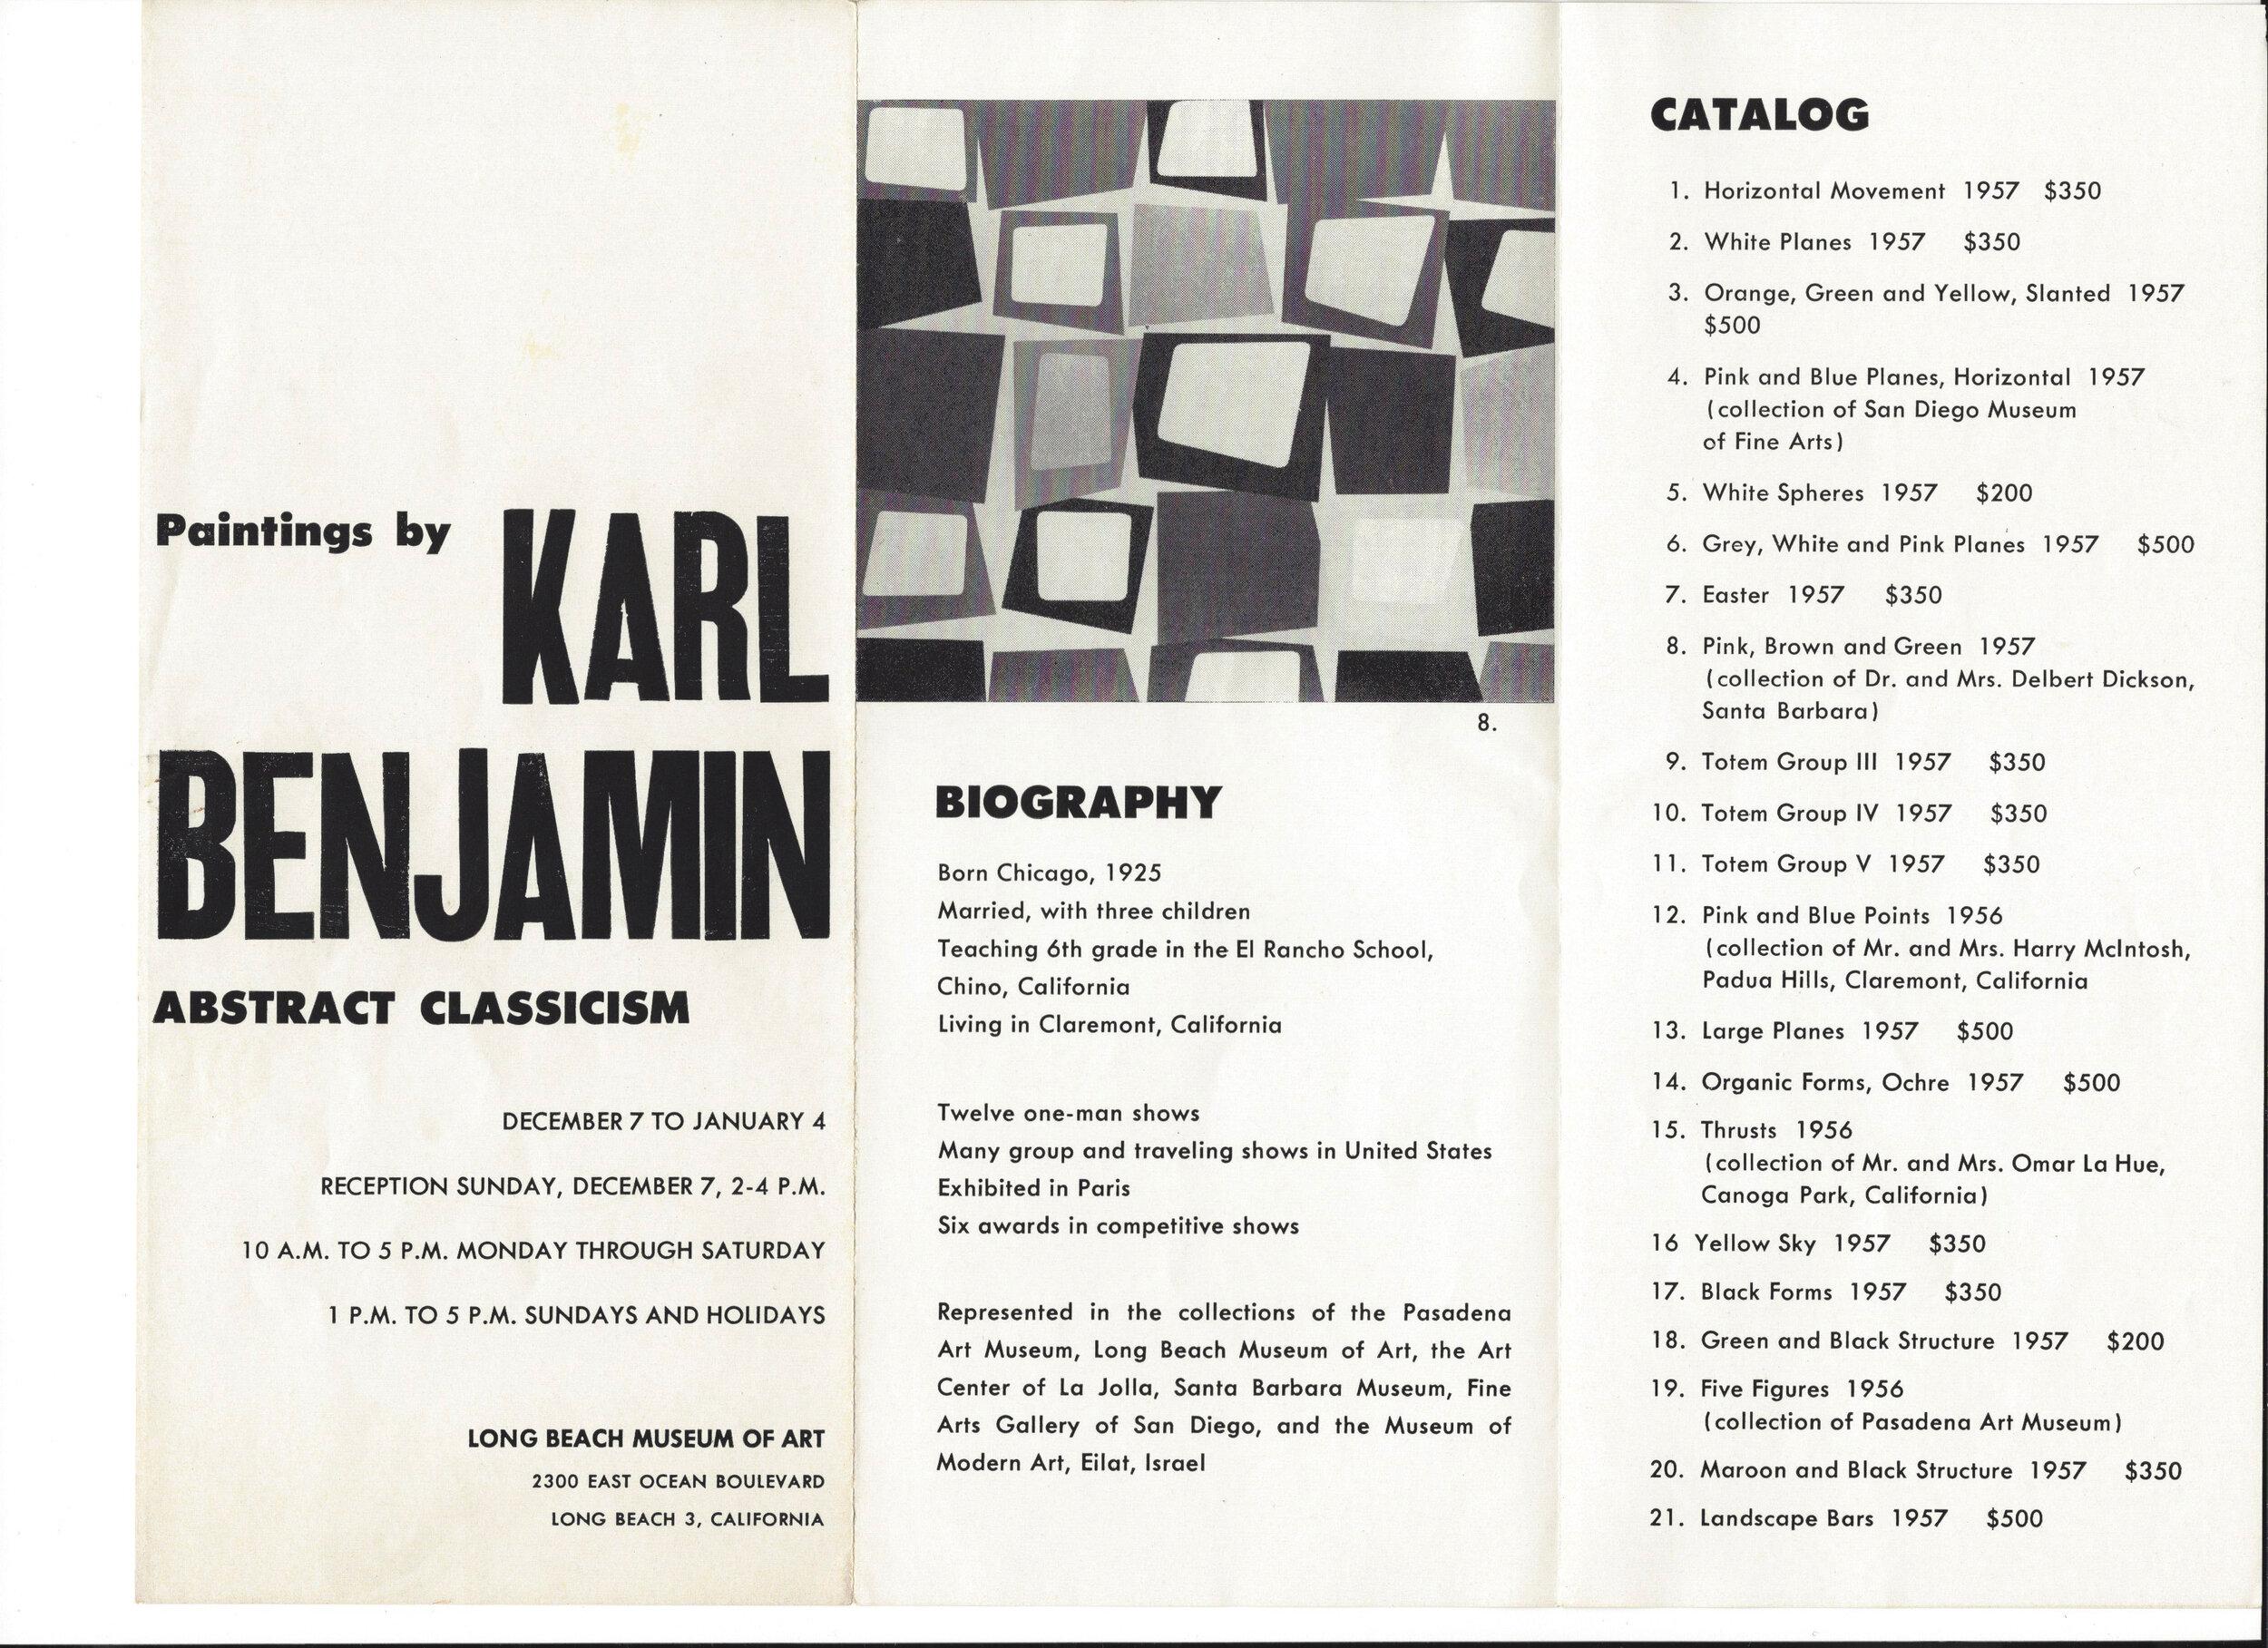 1957 LBMA.jpg